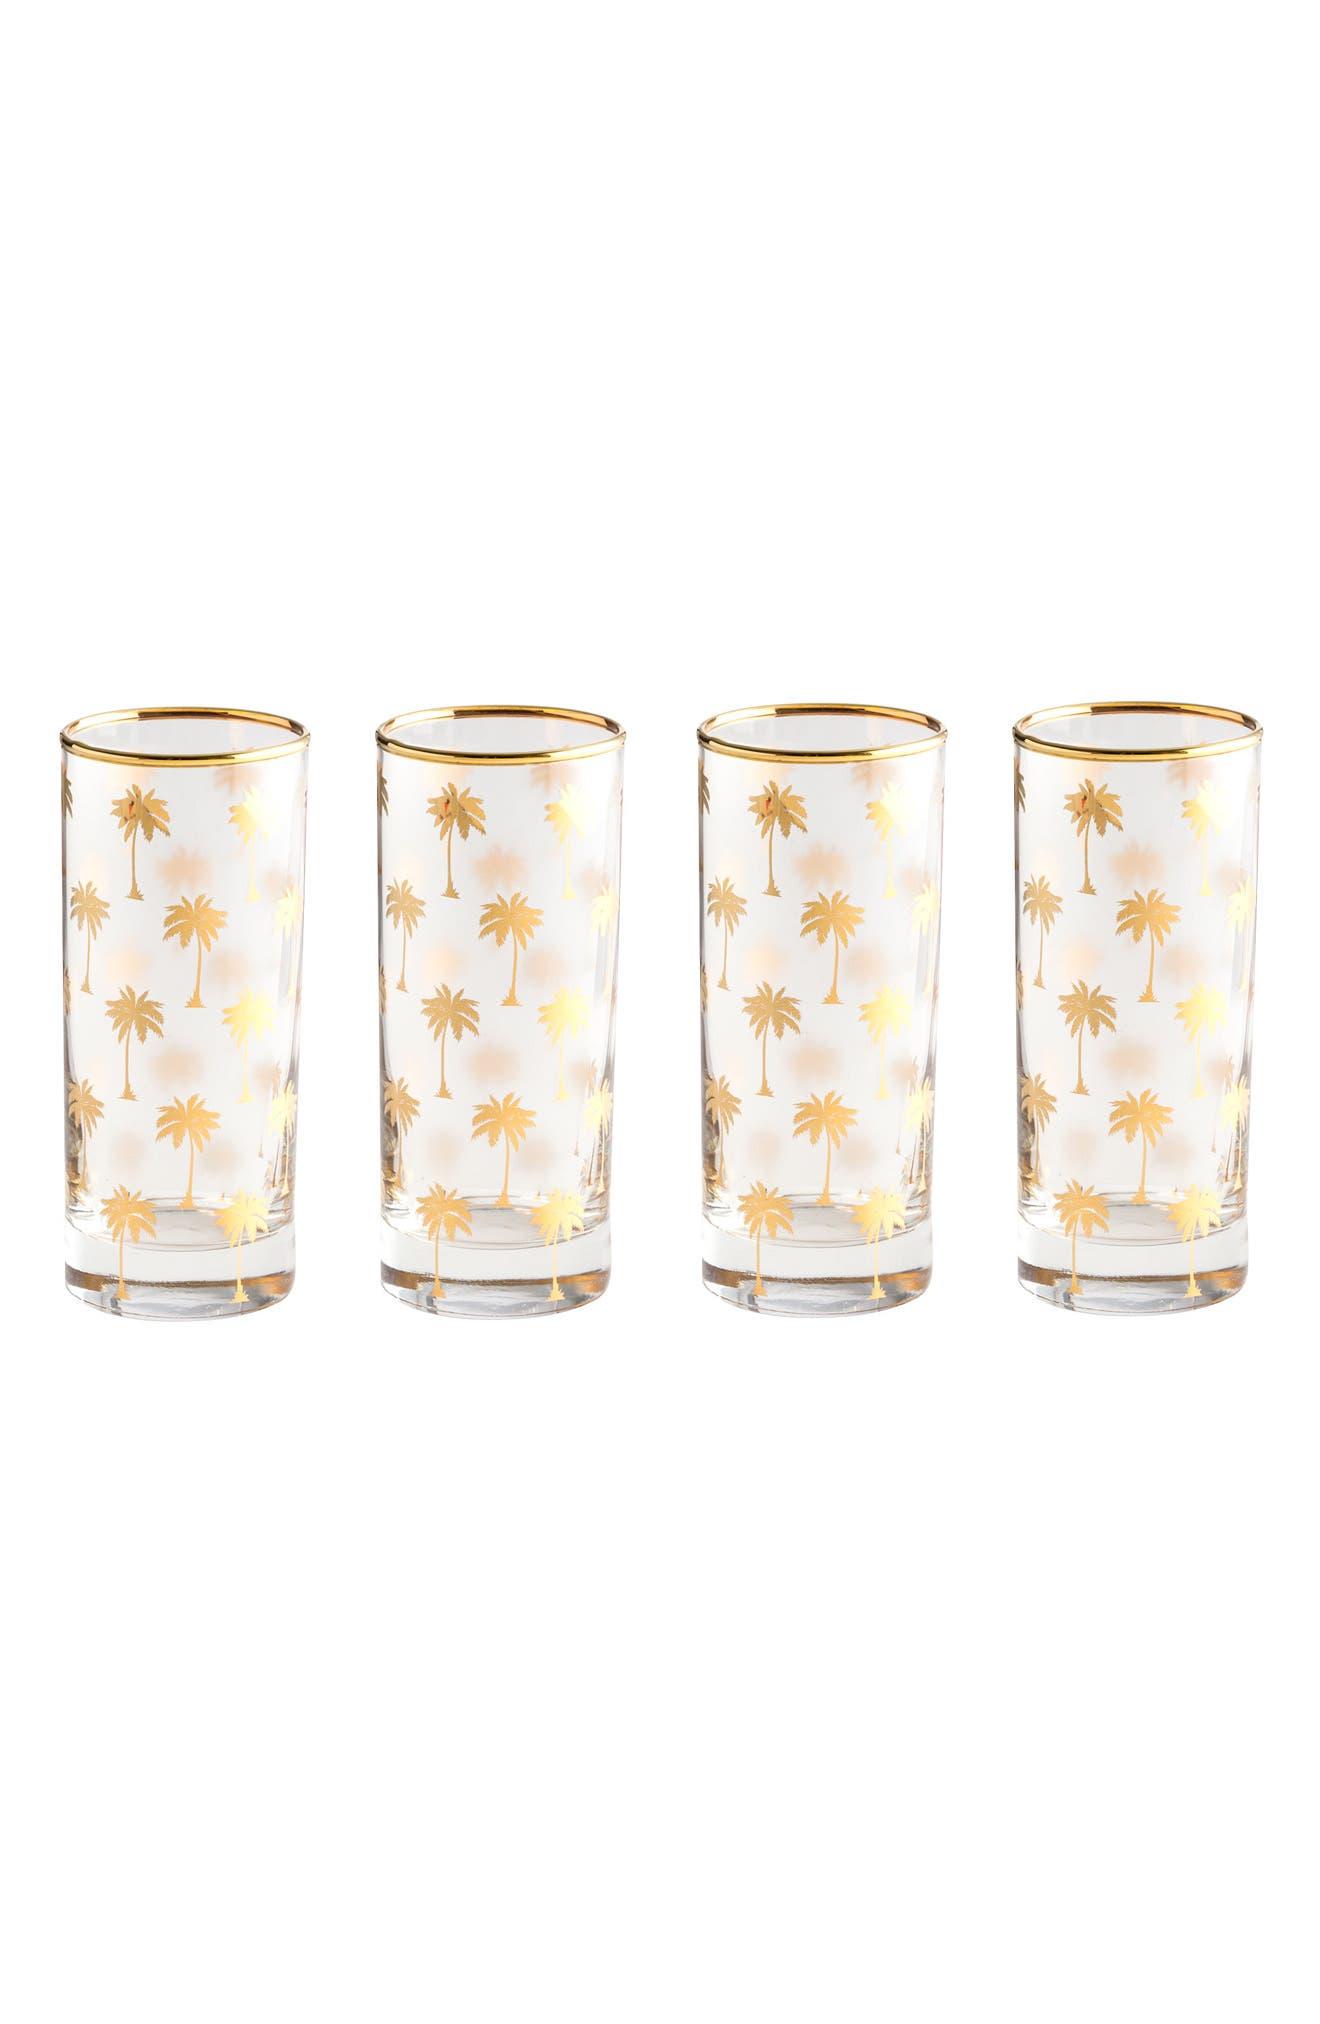 Palm Tree Set of 4 Highball Glasses,                             Main thumbnail 1, color,                             710